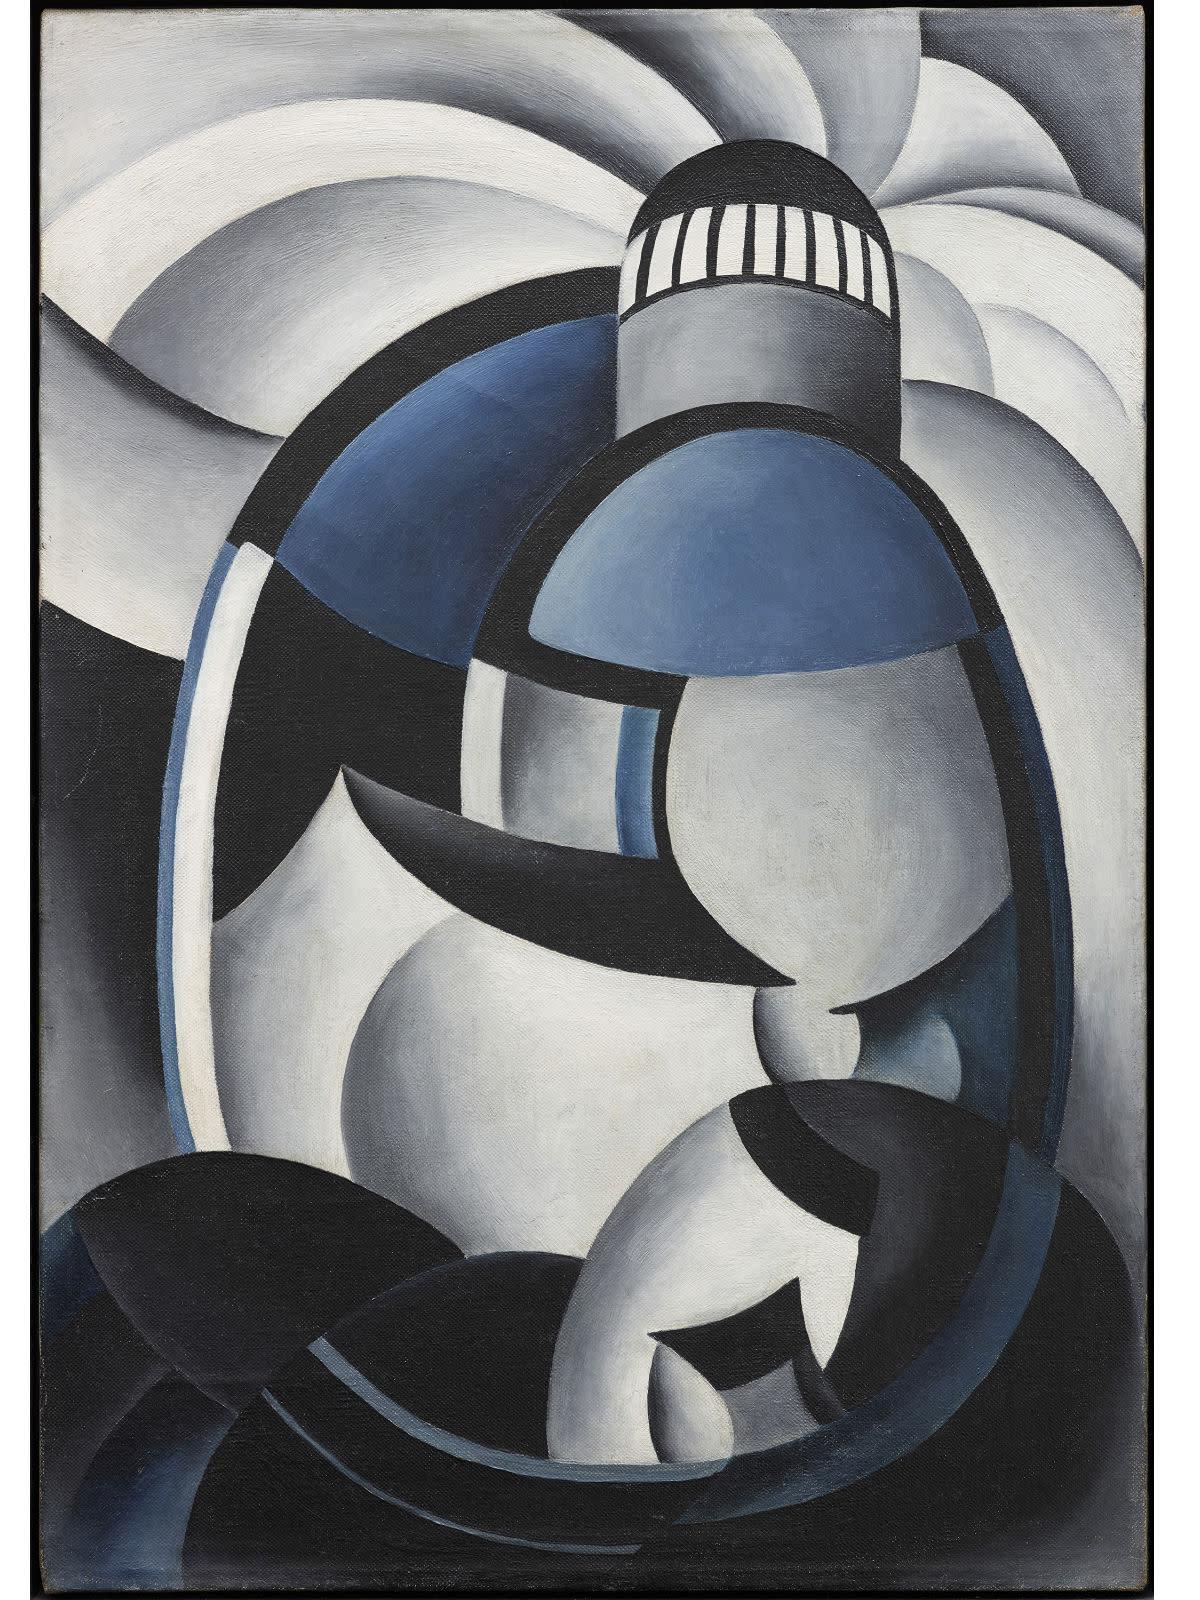 Ida O'Keeffe, Variation on a Lighthouse Theme